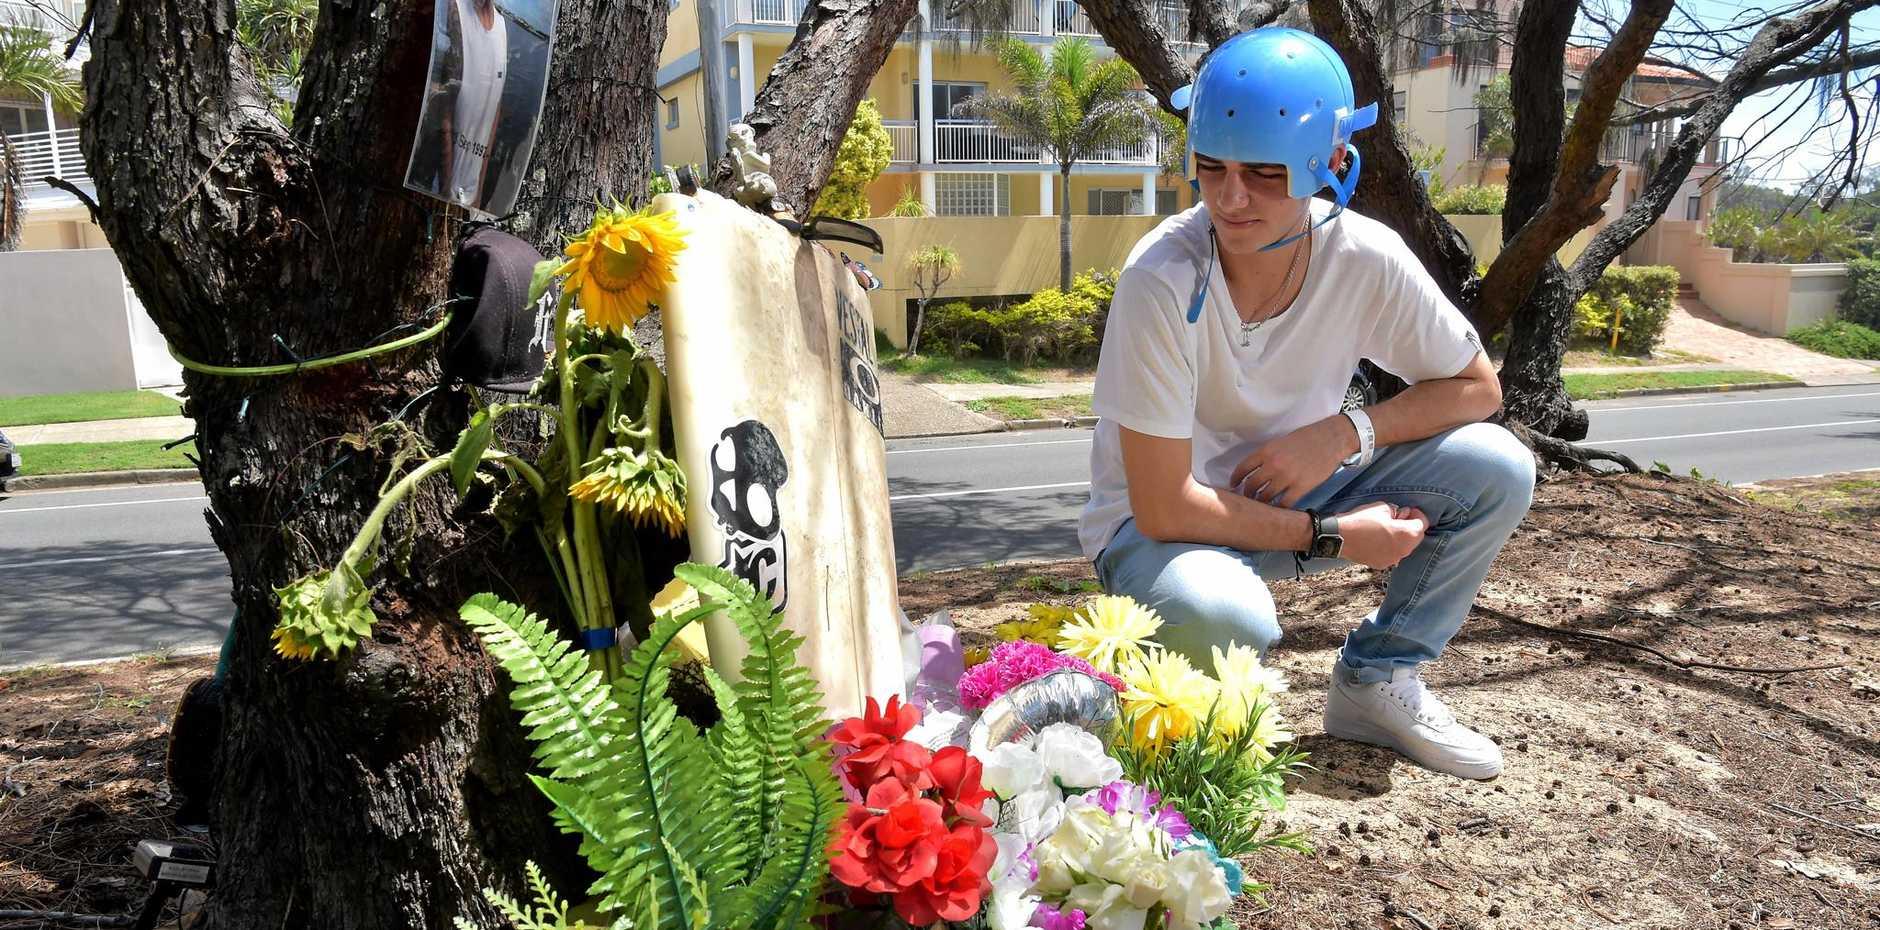 TRAGIC TOLL: Survivor Josh Harrison visits the Buddina scene of a January crash which killed his mate Bailey Sibraa.